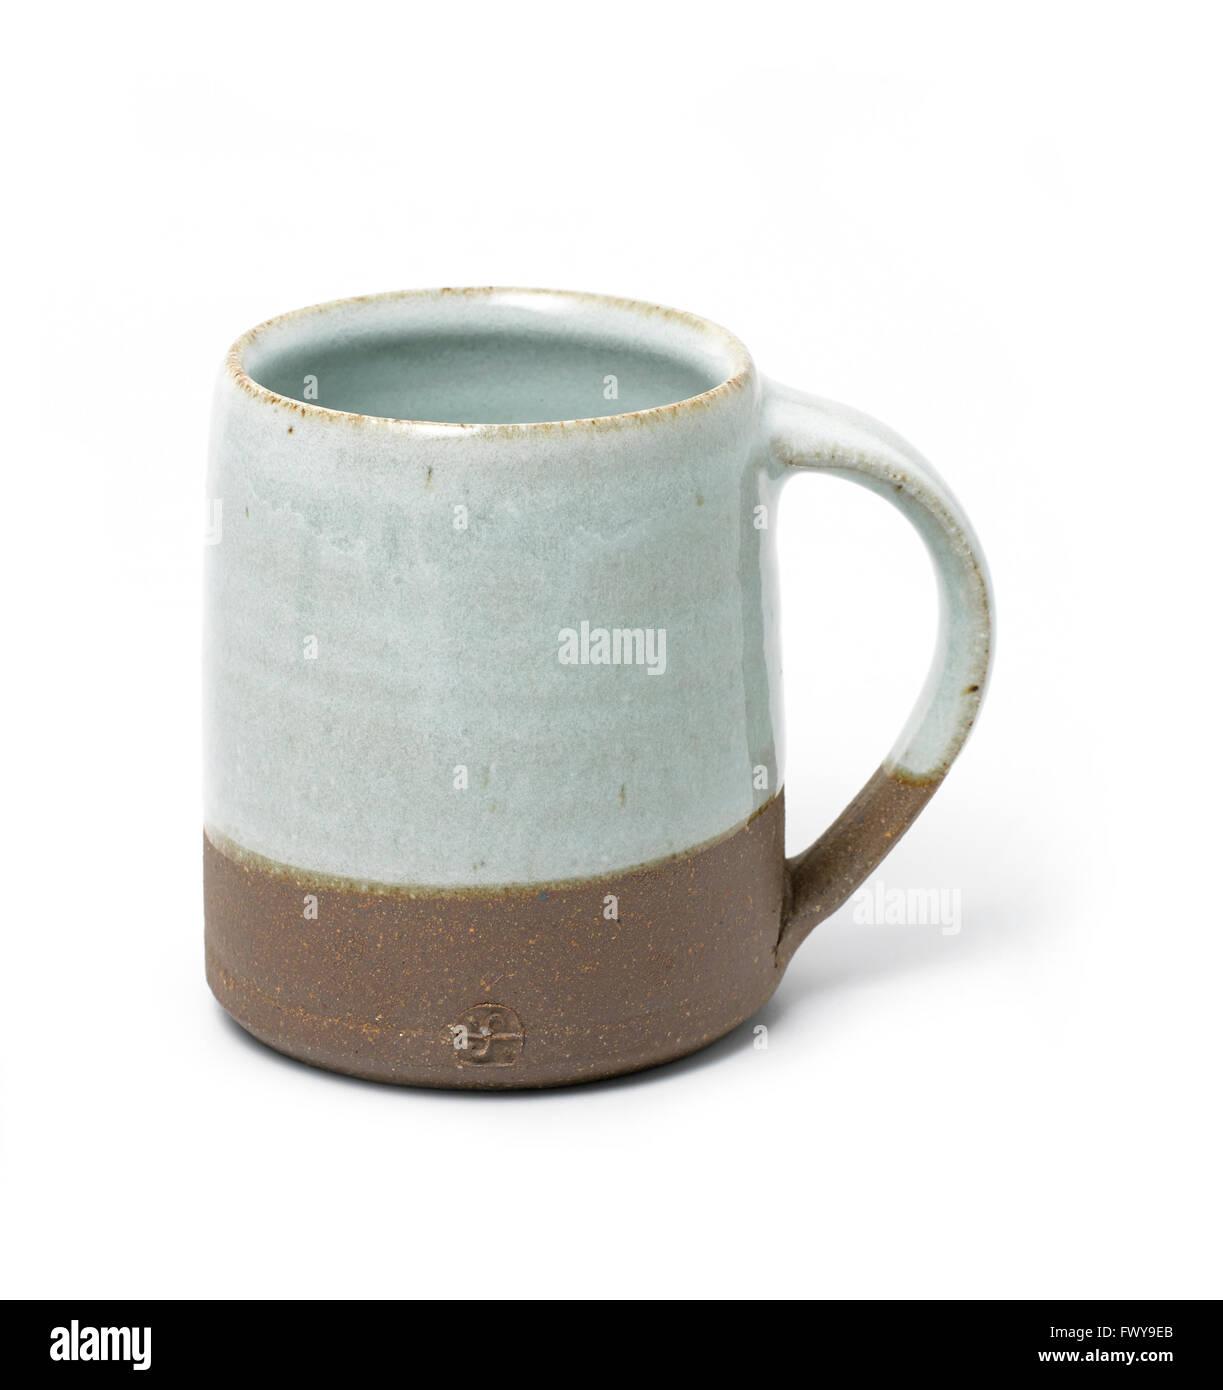 Earthenware grey brown mug white background - Stock Image